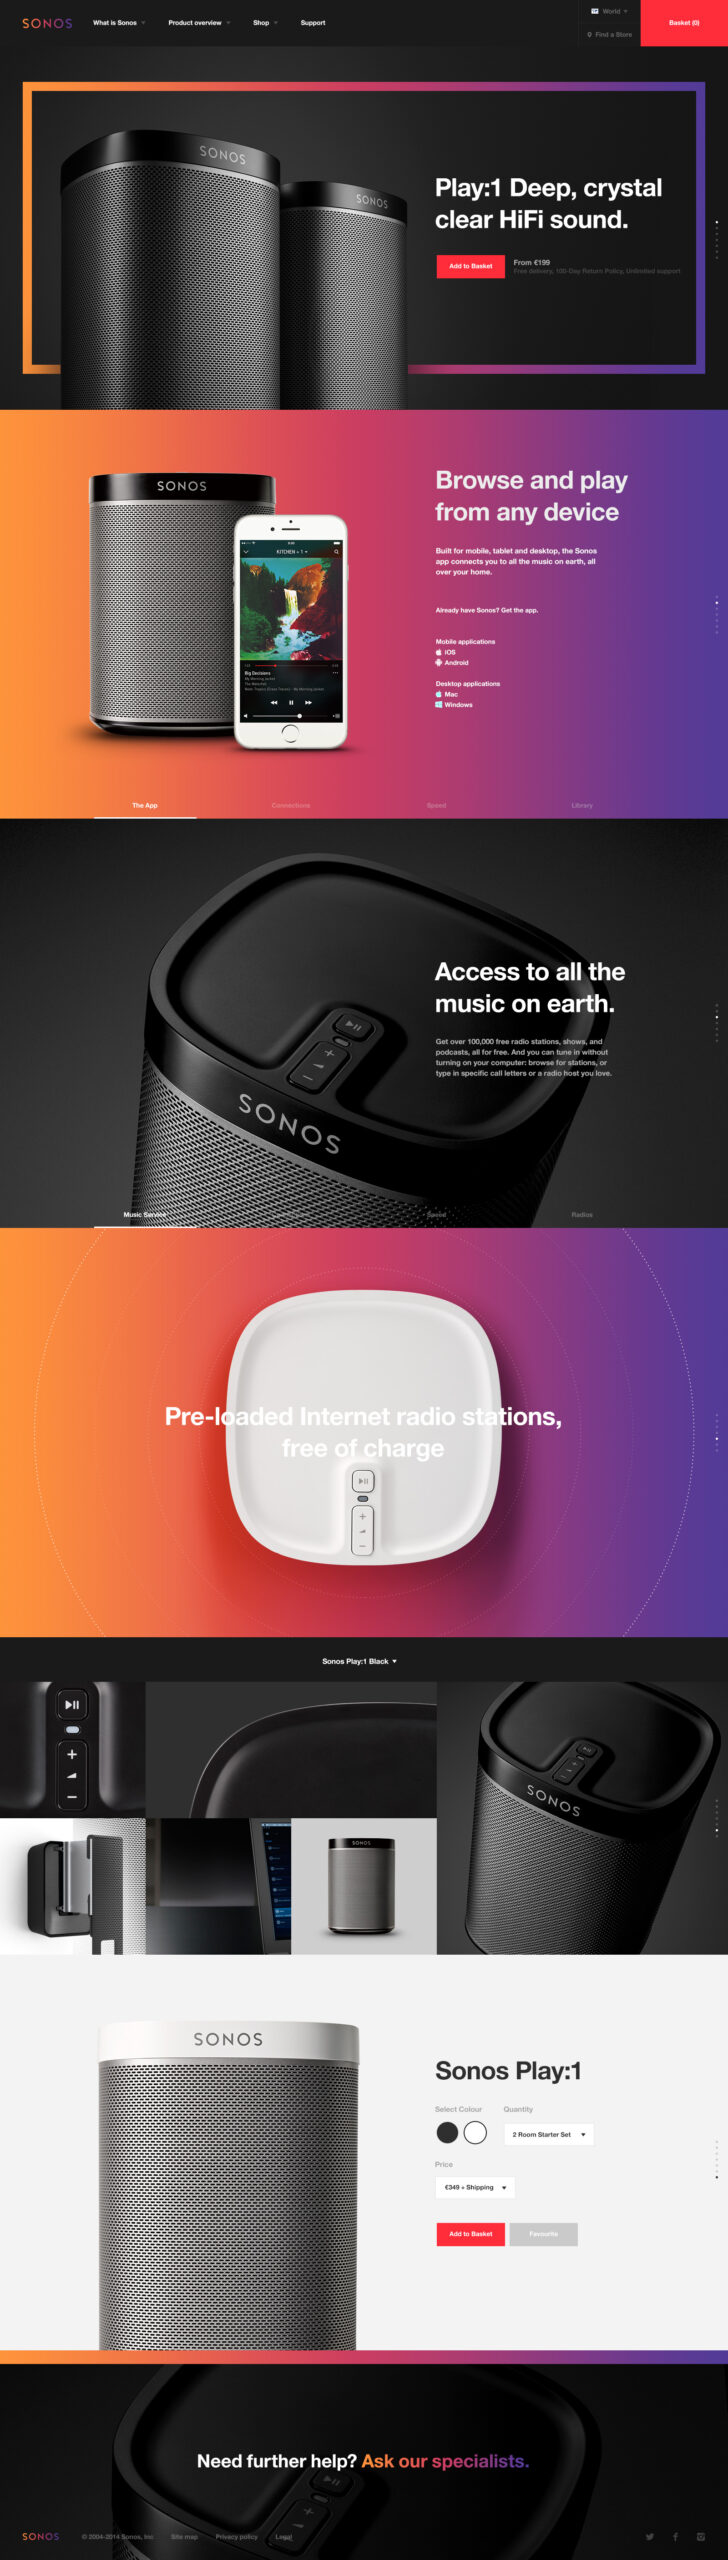 Webdesign Inpiration Sonos - rafaelkfouri.com